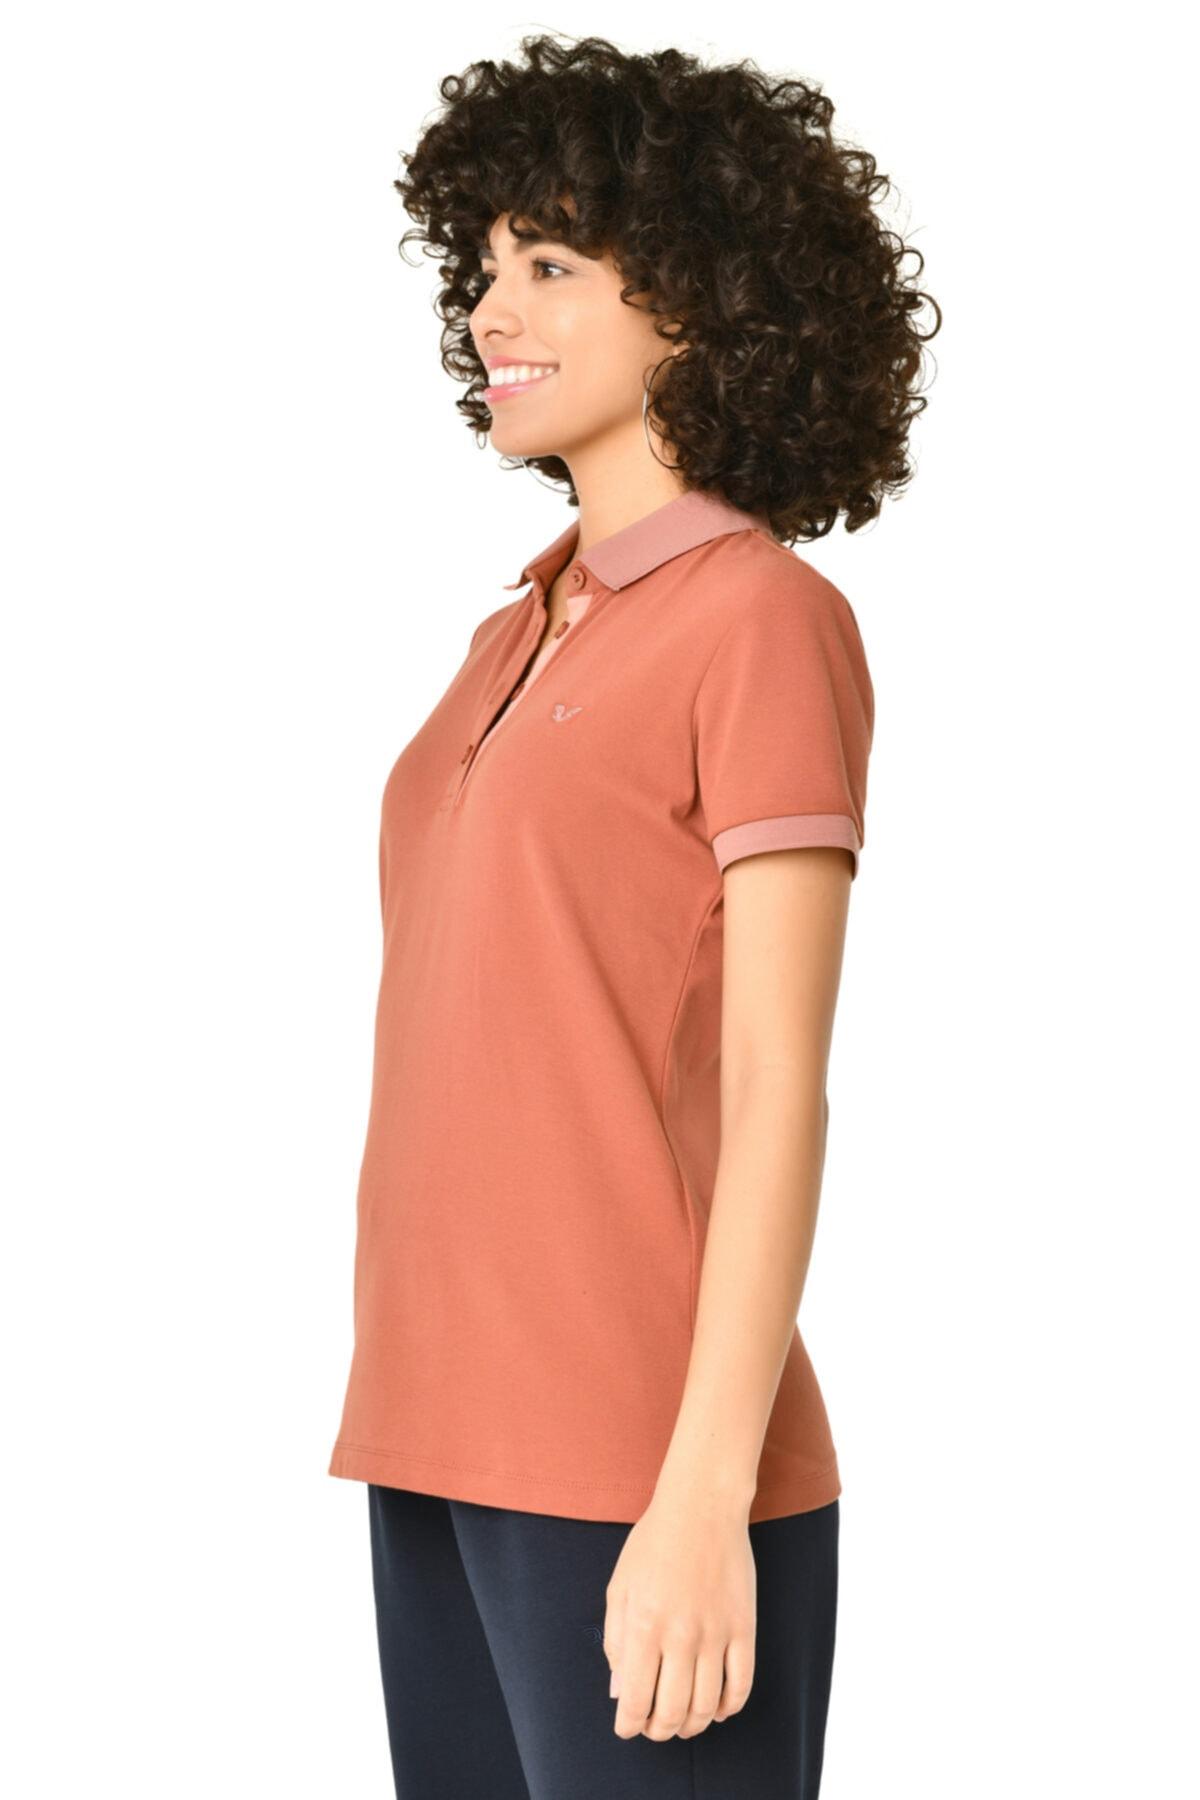 bilcee Kadın Toprak Polo Yaka Tshirt Hs-8719 2